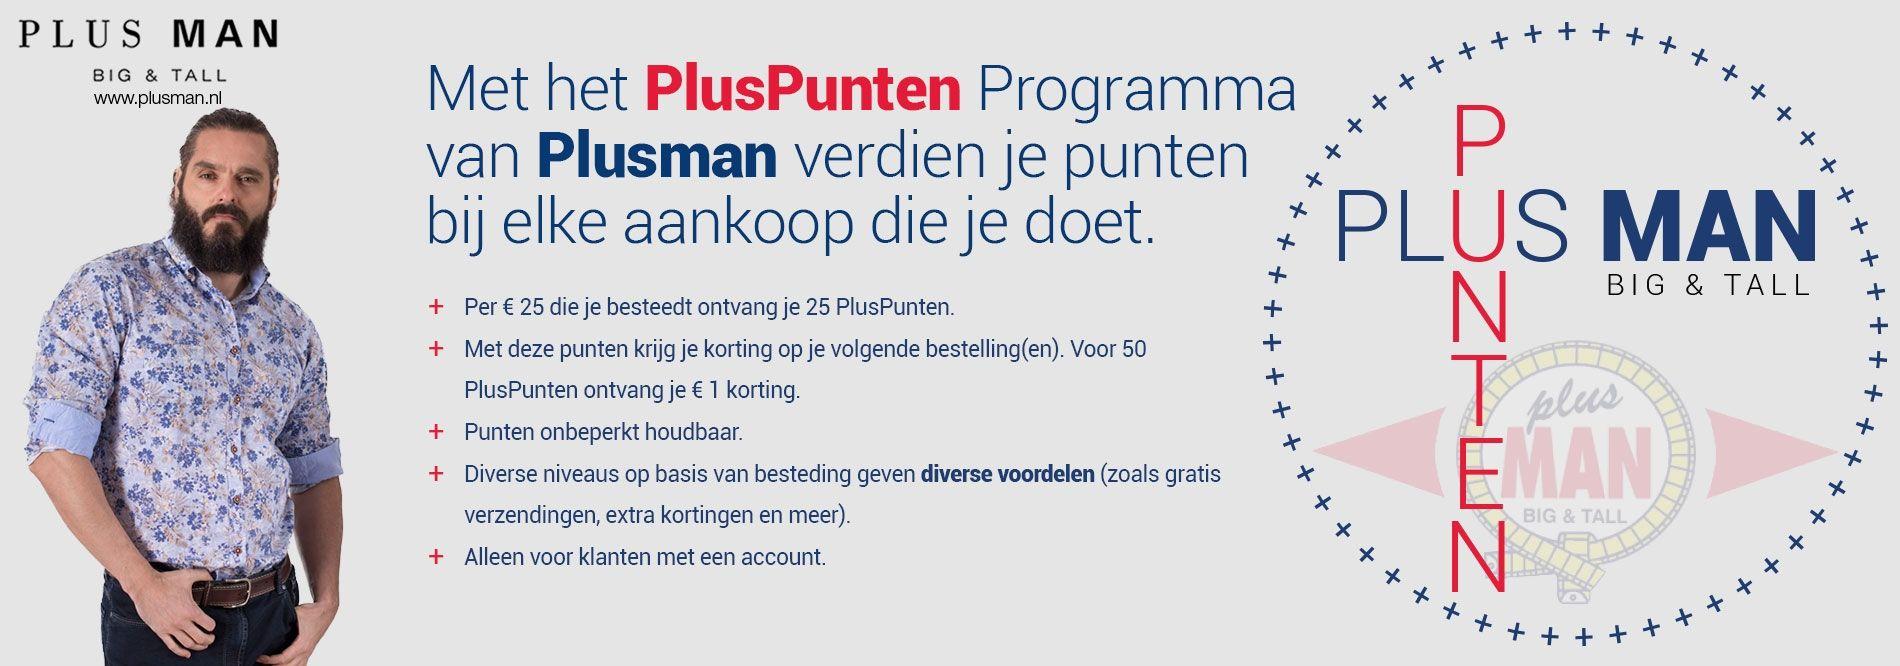 Het loyaliteitsprogramma van Plusman - PlusPunten